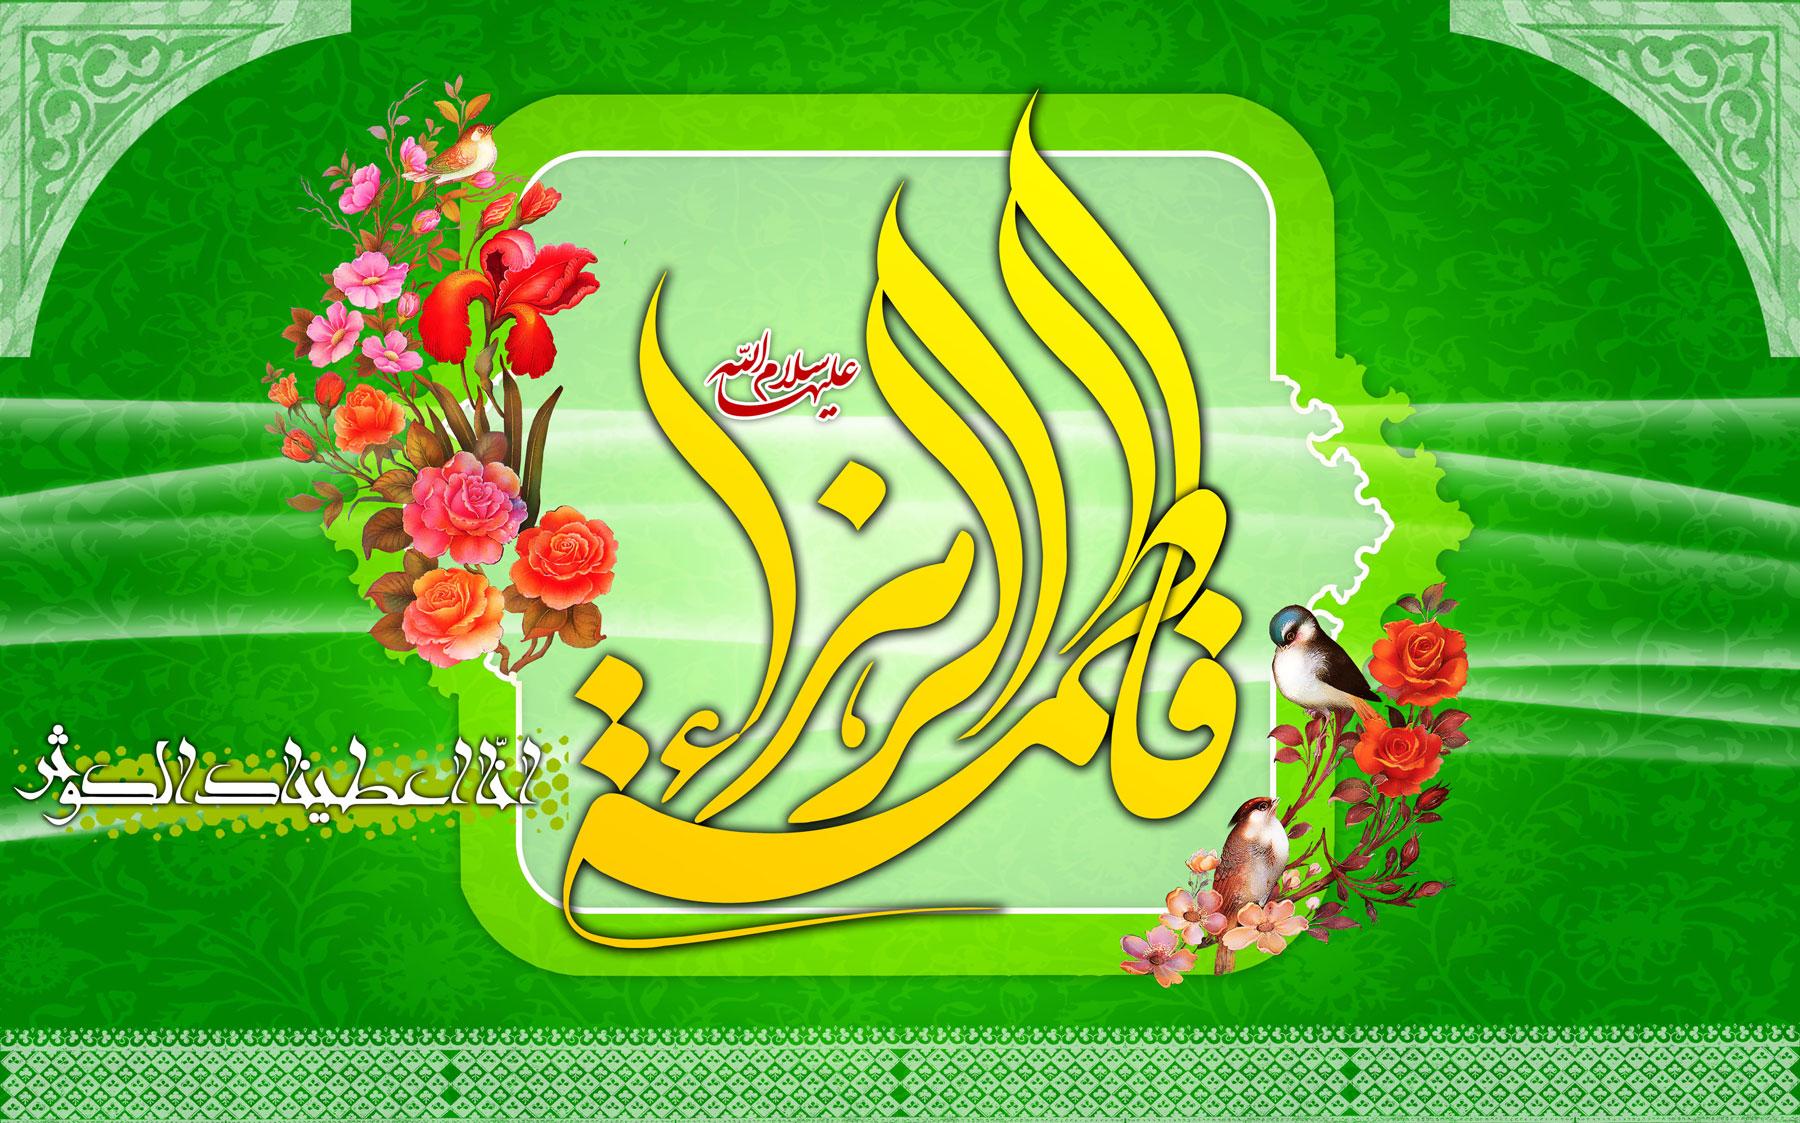 hazrate fatemeh.bashiran%20%281%29 تصاویر باکیفیت ویژه میلاد حضرت زهرا (س)